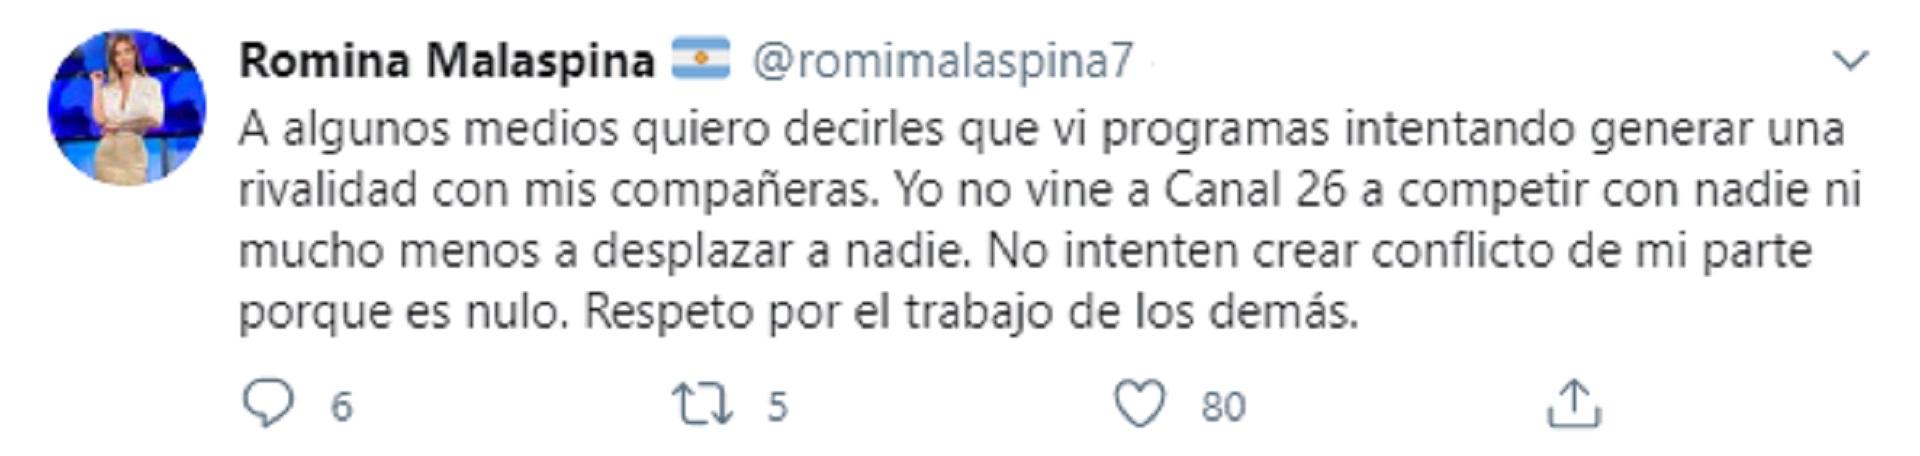 El tuit de Romina Malaespina